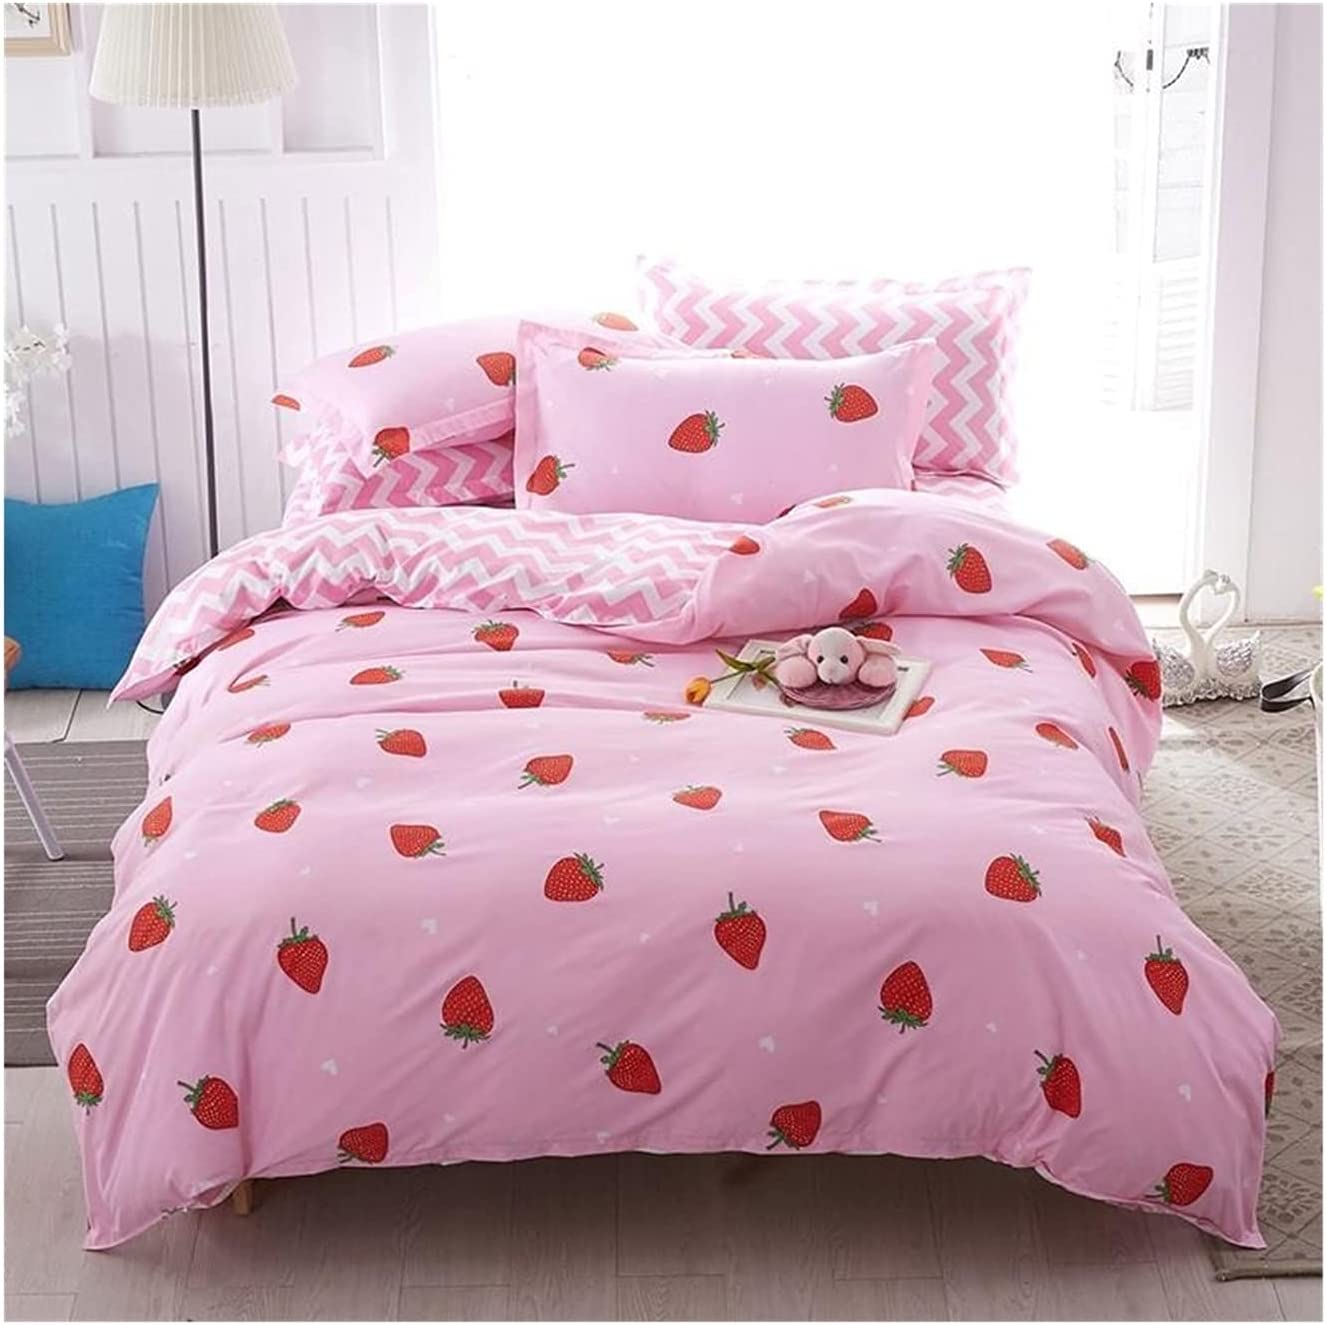 LSDJ QMDSH Branded goods Home Textile Girl Bedding Set Peach lowest price Pink Duvet Cover